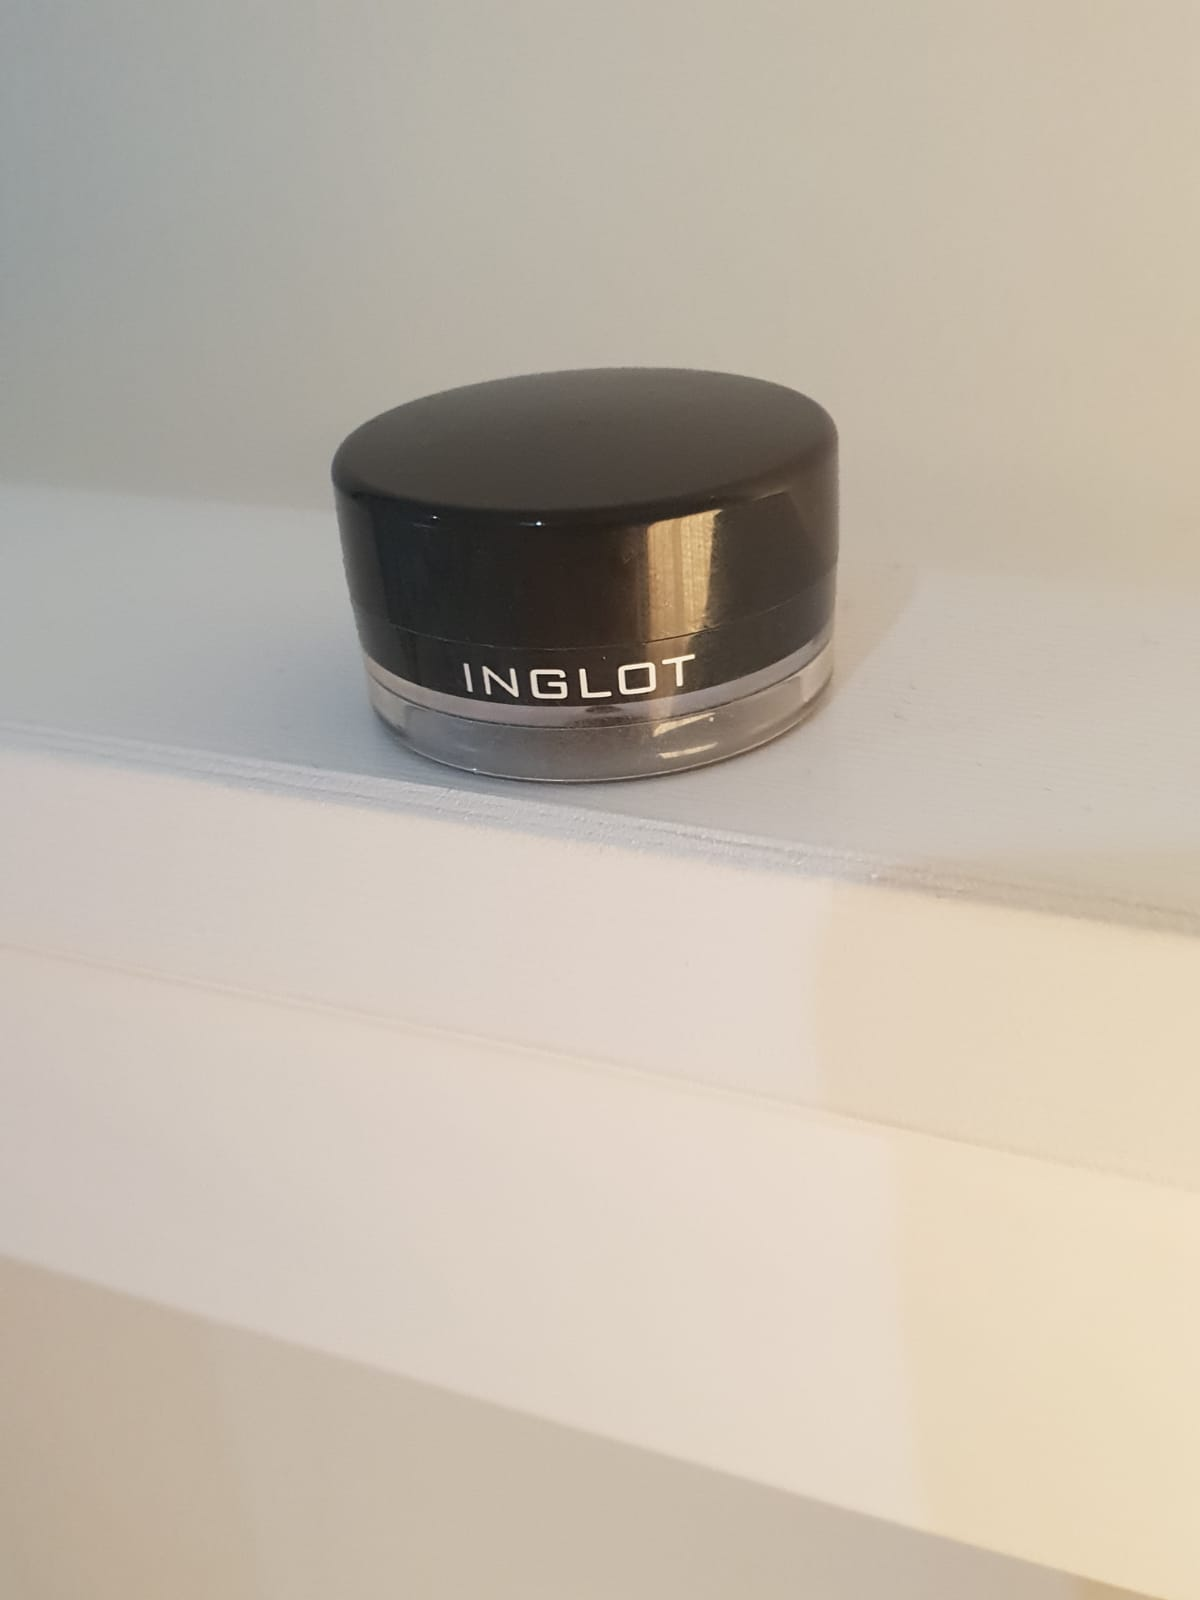 Inglot Amc Eyeliner Gel-For those eyes!-By poonam_kakkar